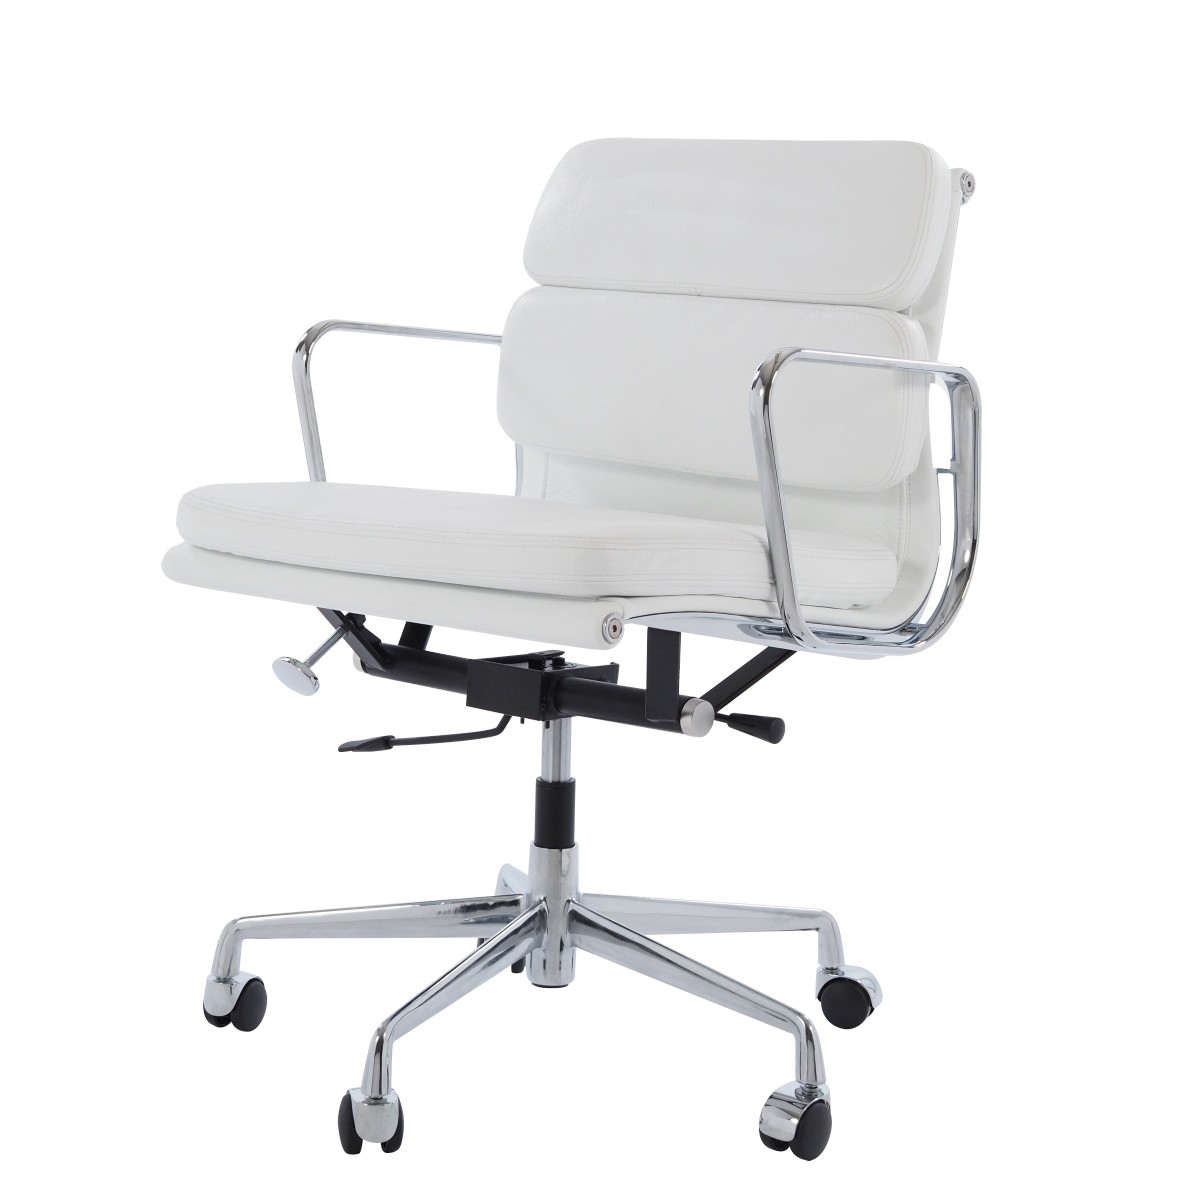 Eames Bureaustoel EA 217 wit in 2020 | Bureaustoel